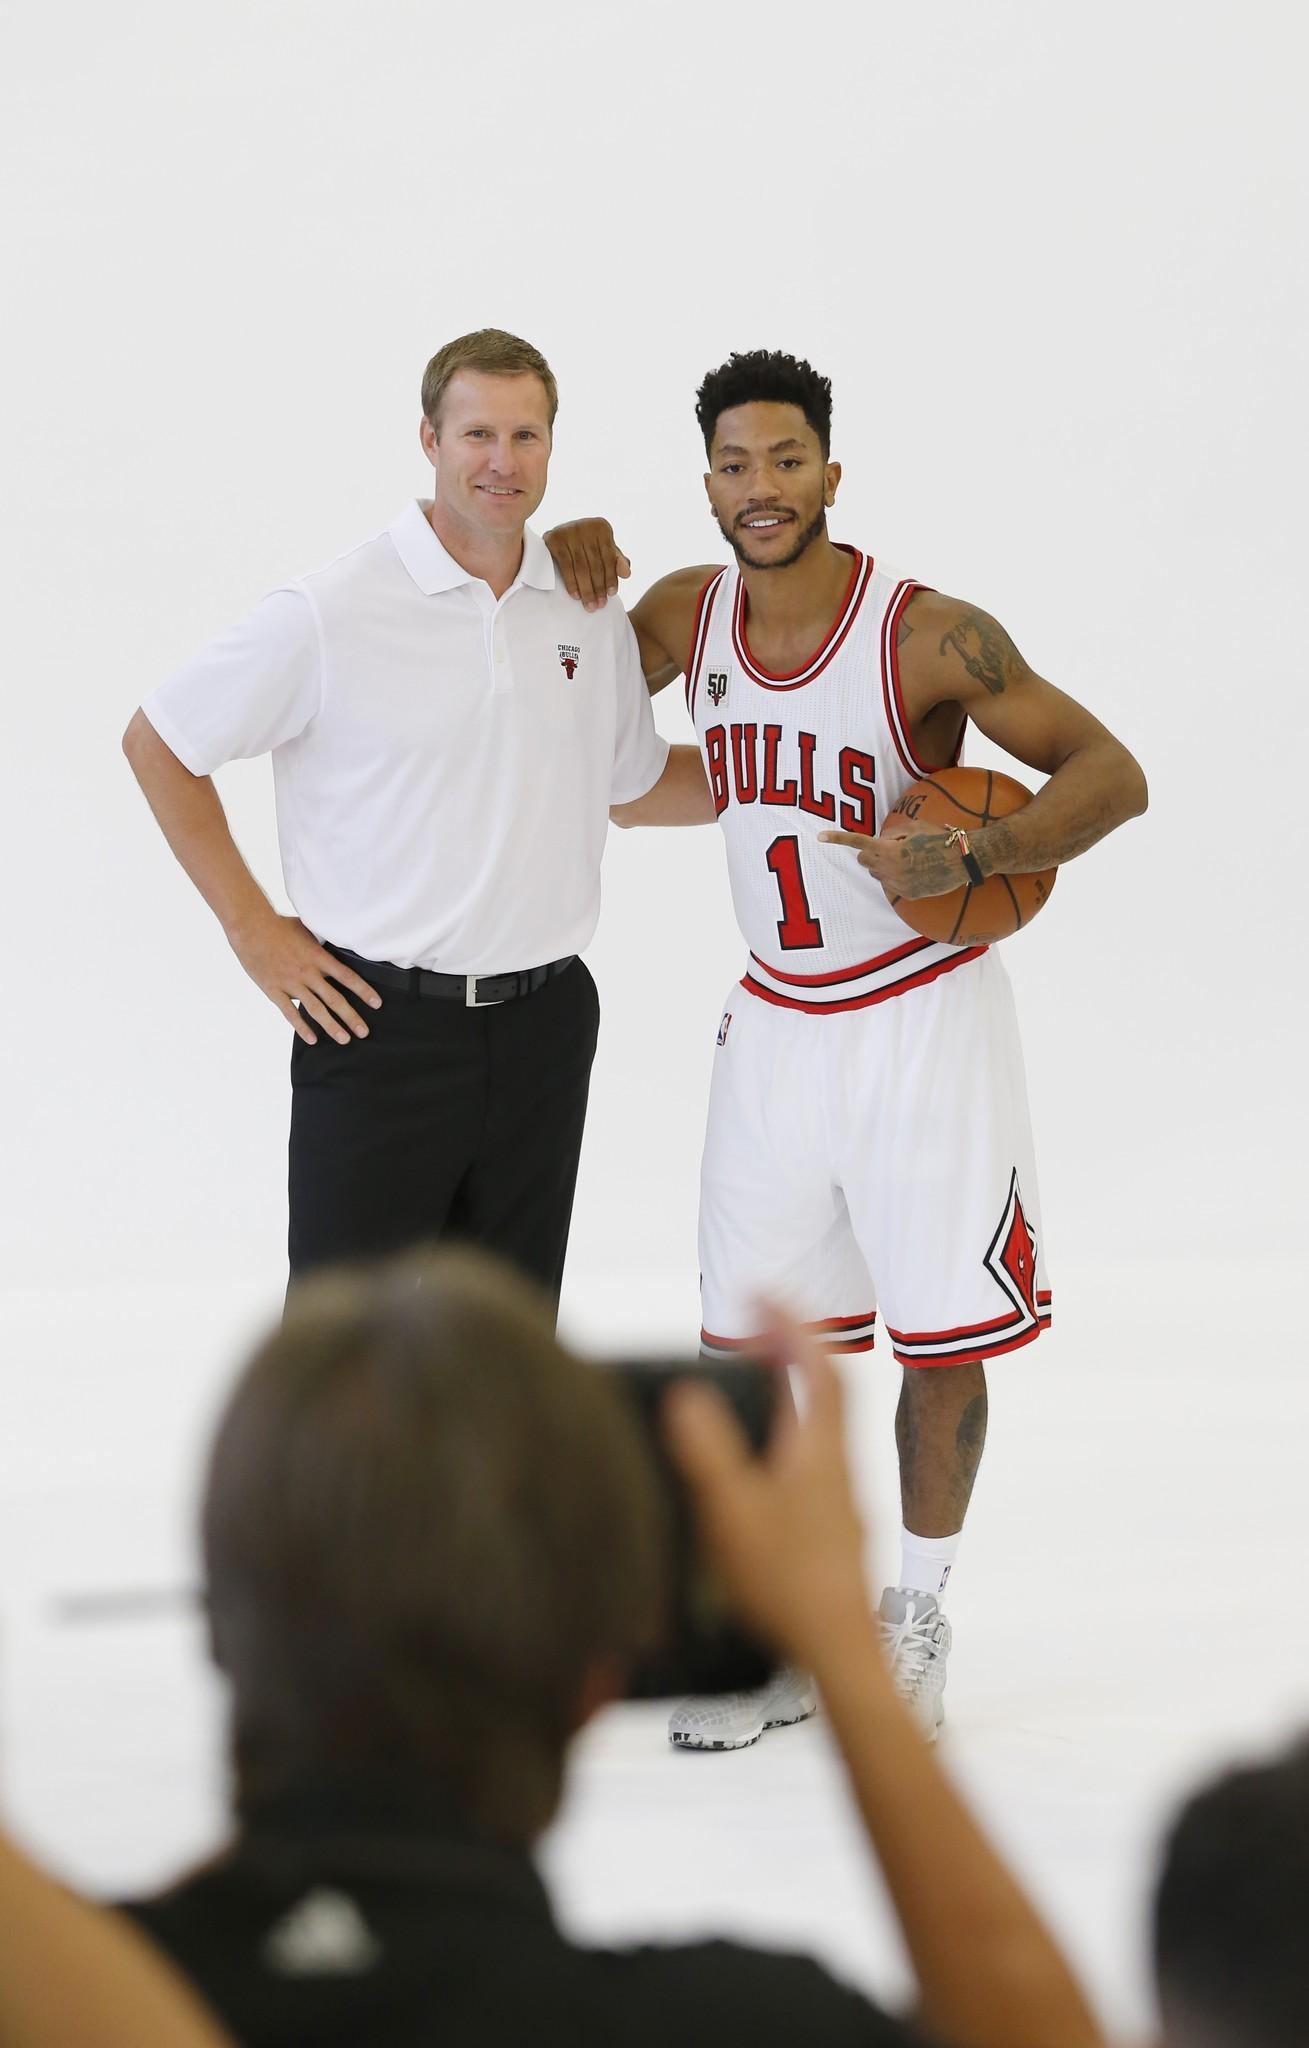 b51c42aa541d Bulls are home schooling injured guard Derrick Rose - Chicago Tribune